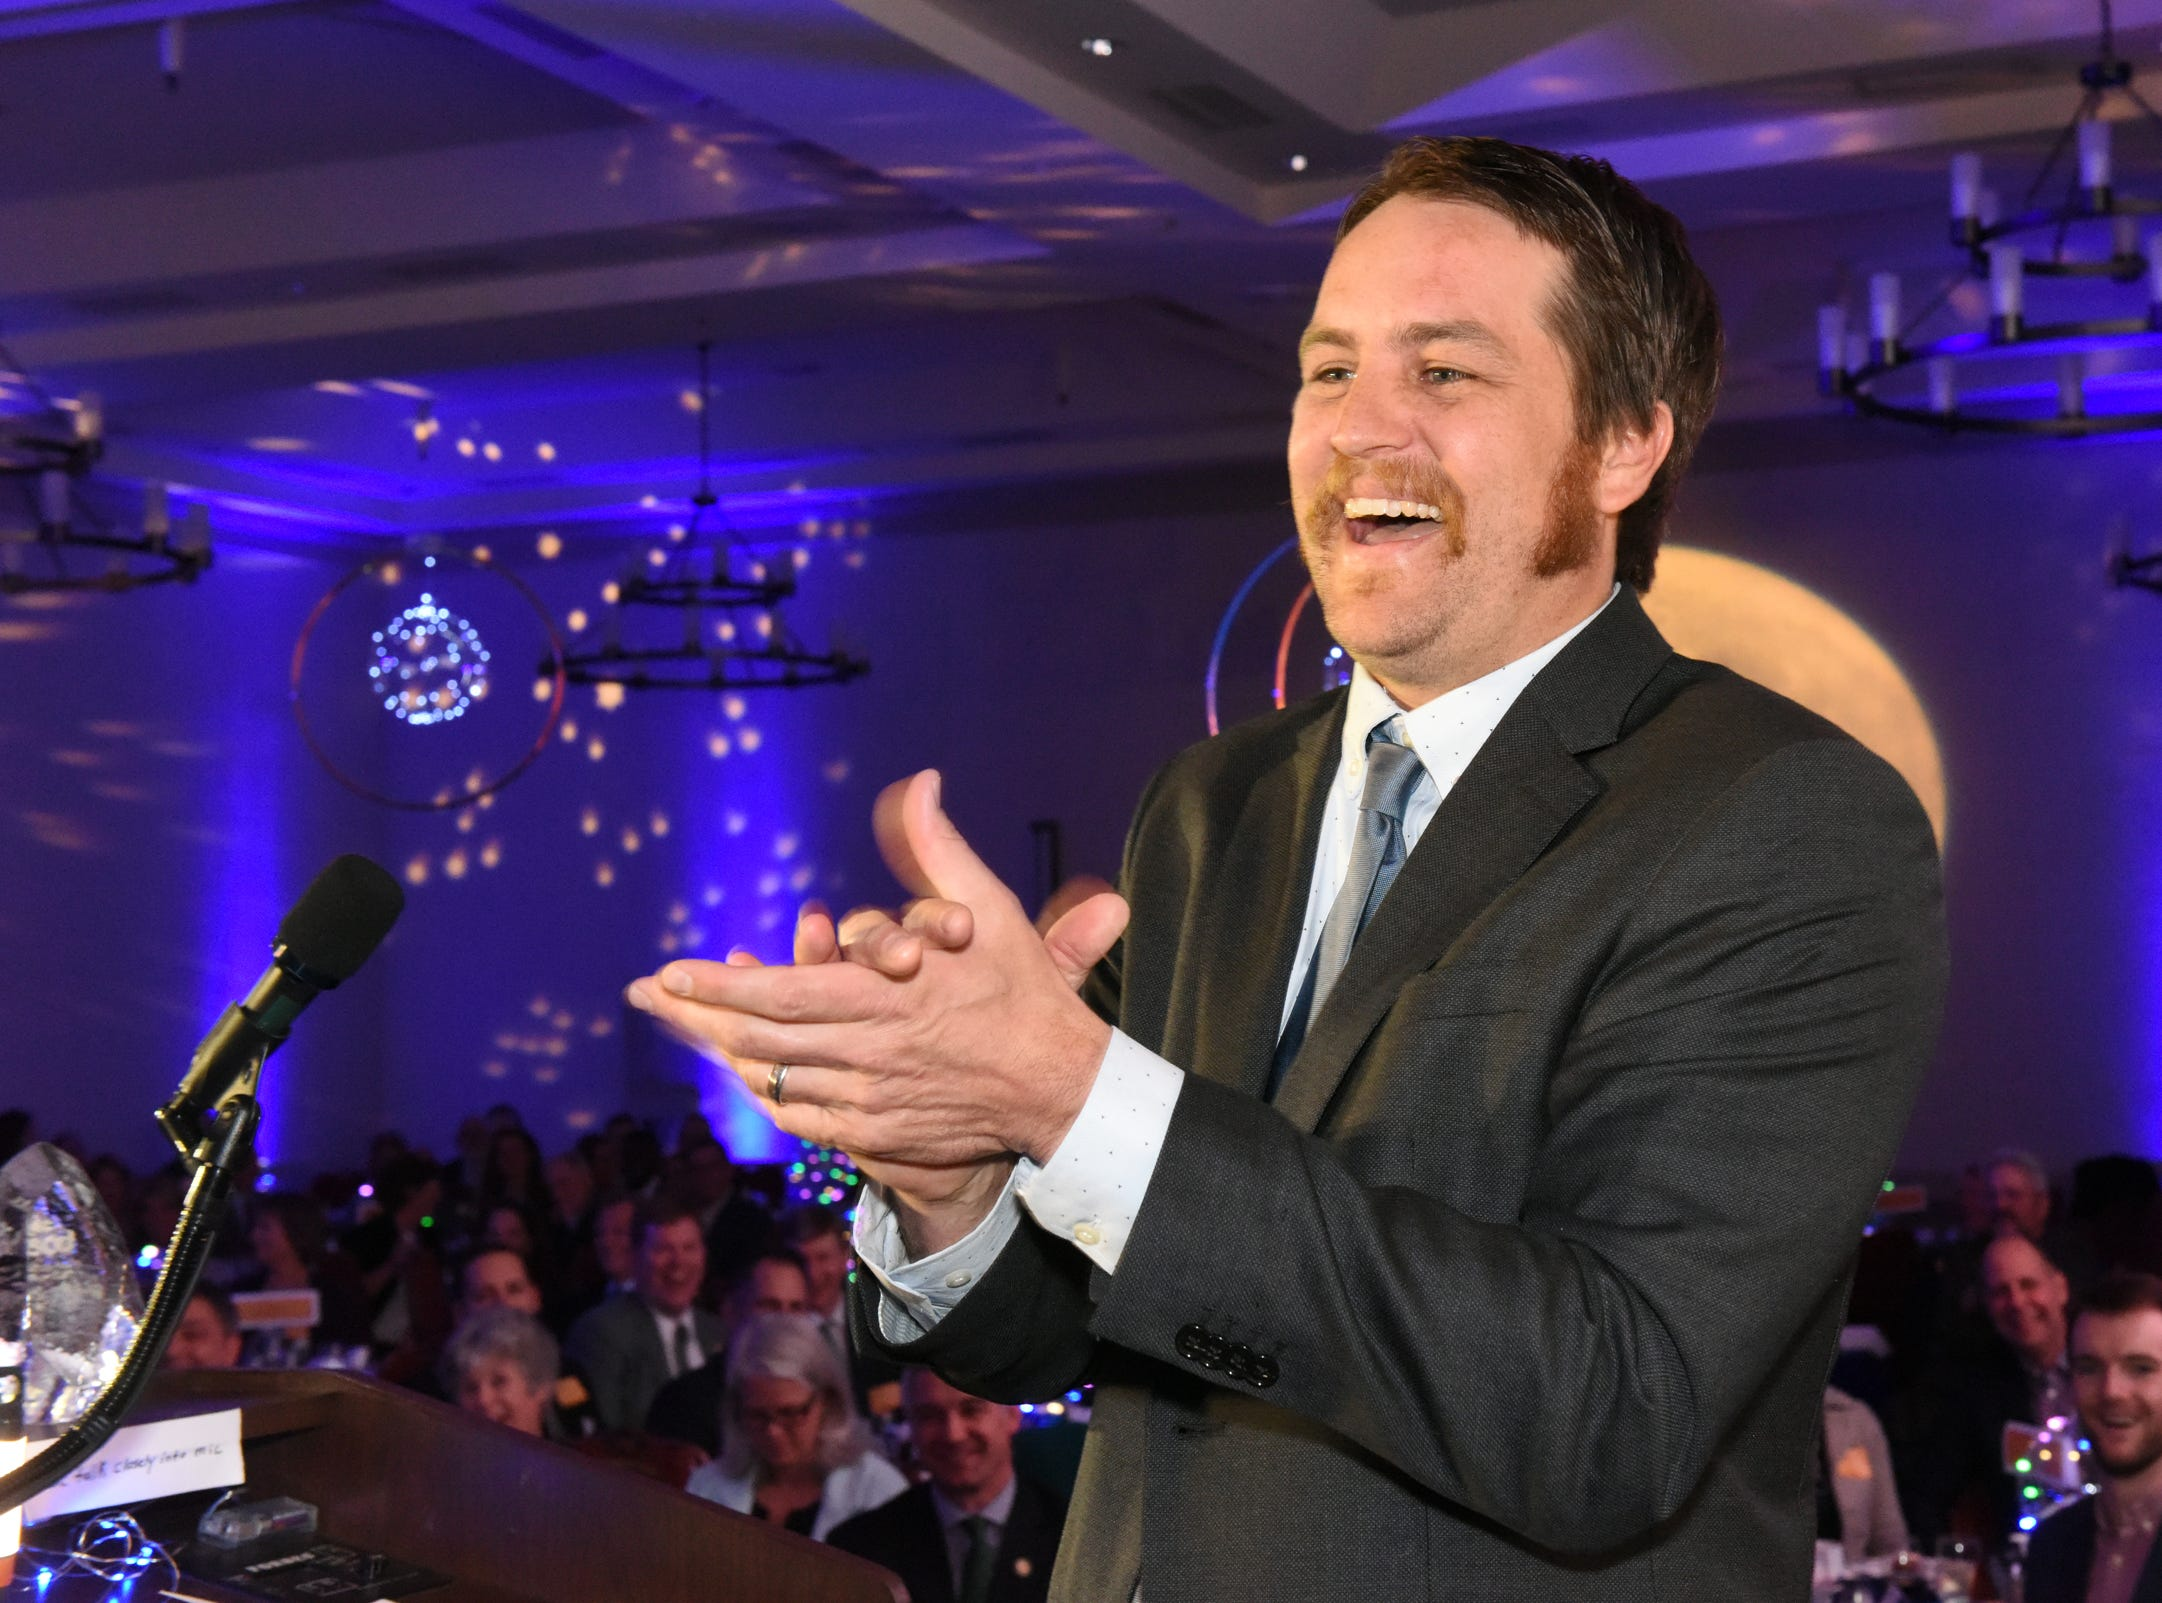 Justin Heilenbach, co-founder of Citizen Cider, accepts the 2019 Burlington Business Award at the 41st BBA Burlington Business Association Dinner & Annual Meeting at the Hilton Burlington Lake Champlain in Burlington, VT on Thursday, April 4, 2019.